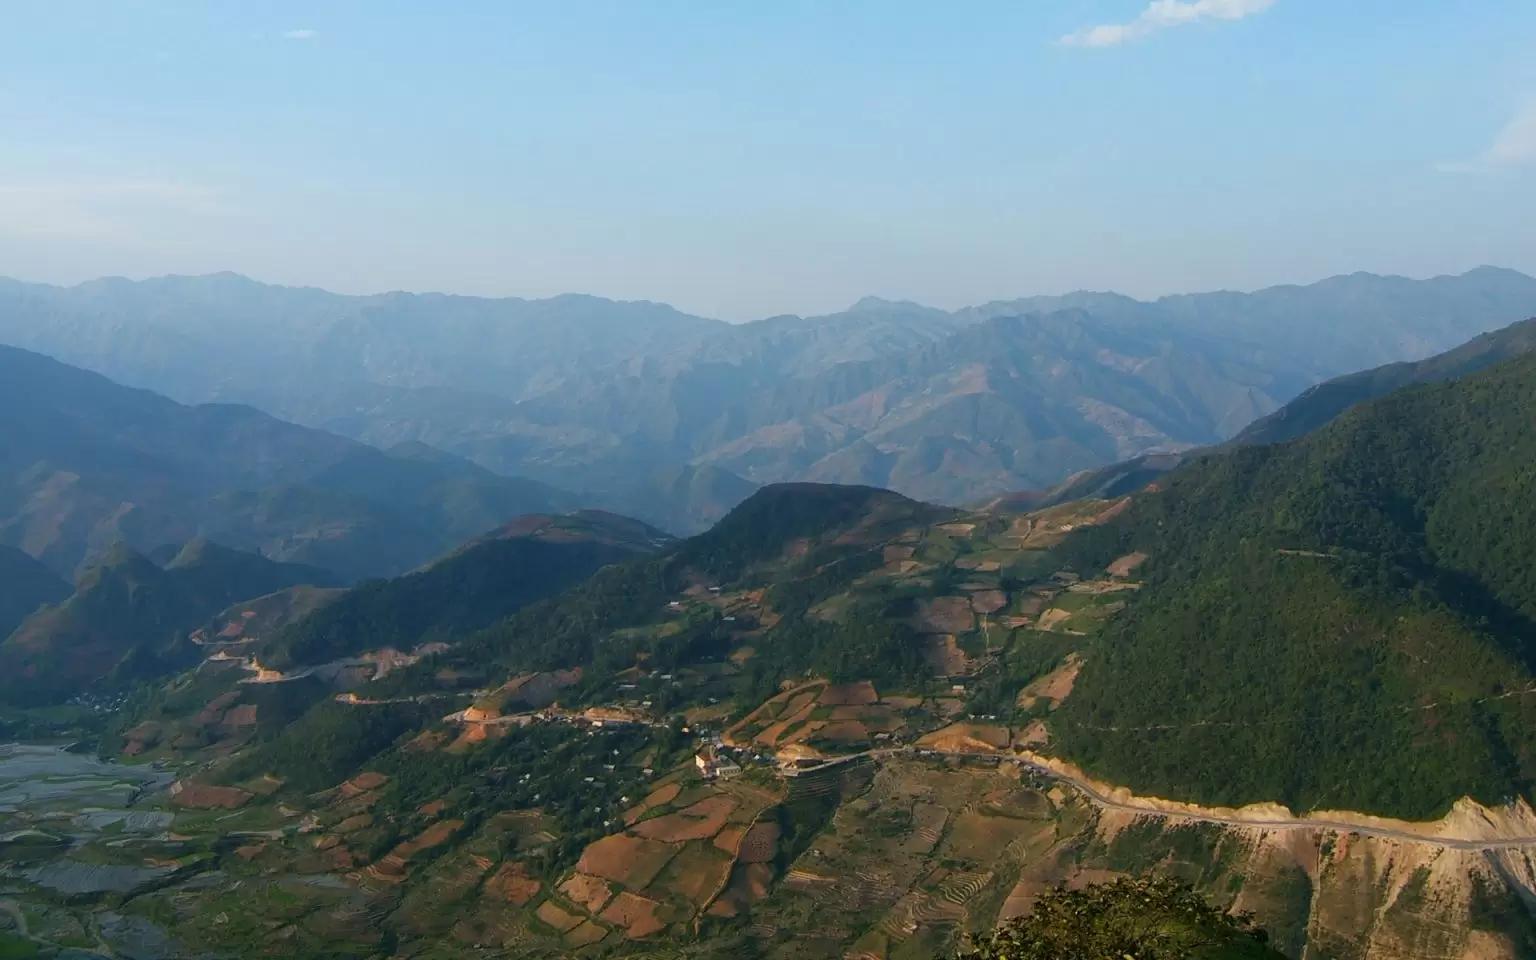 Khau Pha Pass in Yen Bai is one of the four greatest passes in northwest Vietnam. (Photo: Vietnamtravel)